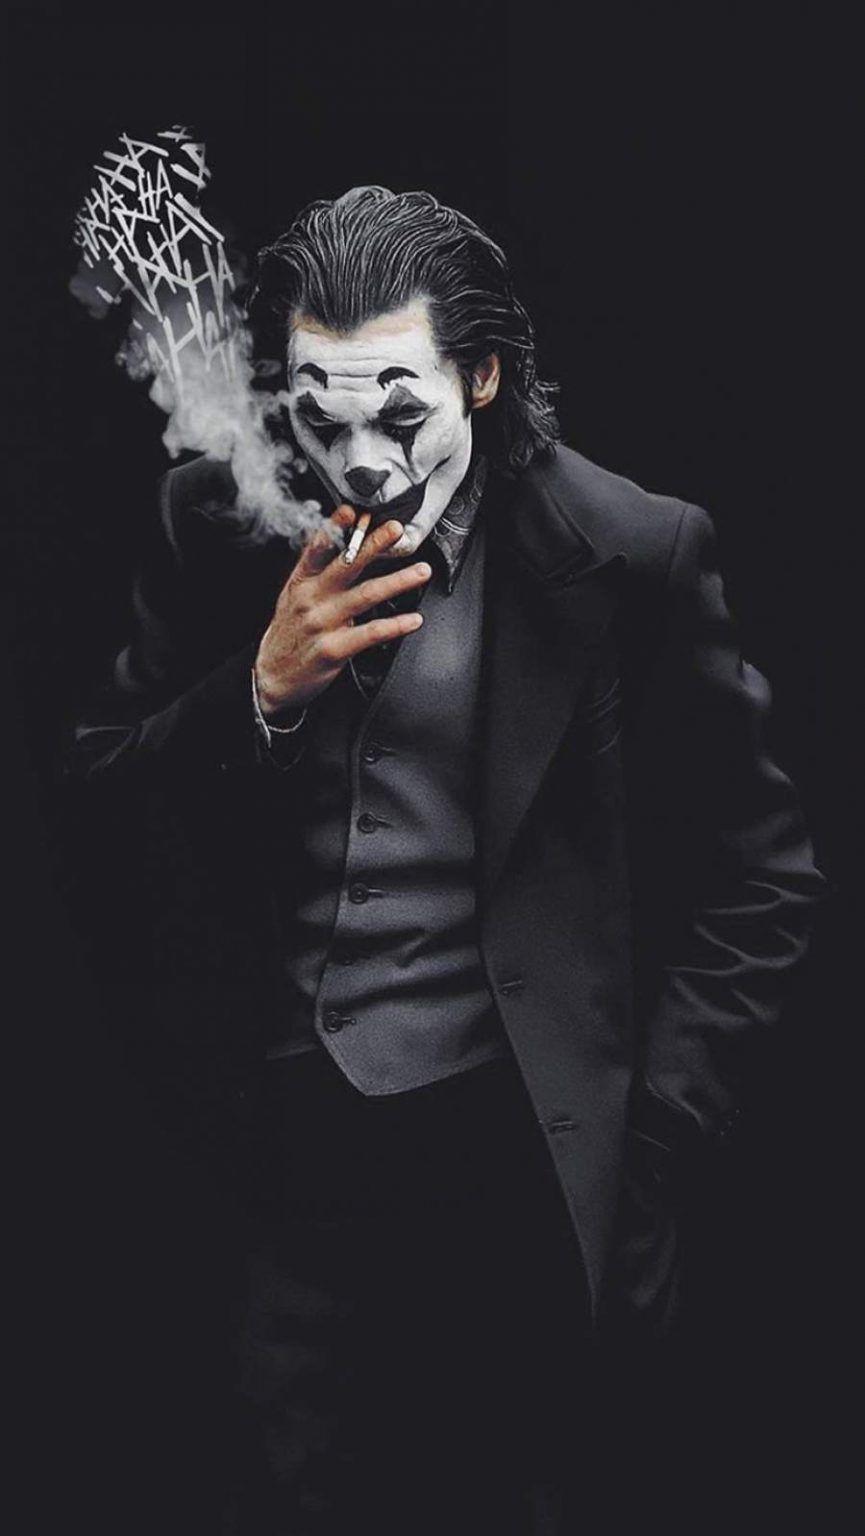 Joker Smoke Laugh Iphone Wallpaper Iphone Wallpapers Iphone Wallpapers In 2021 Joker Wallpapers Joker Hd Wallpaper Hipster Wallpaper Joker 2021 hd wallpaper for mobile